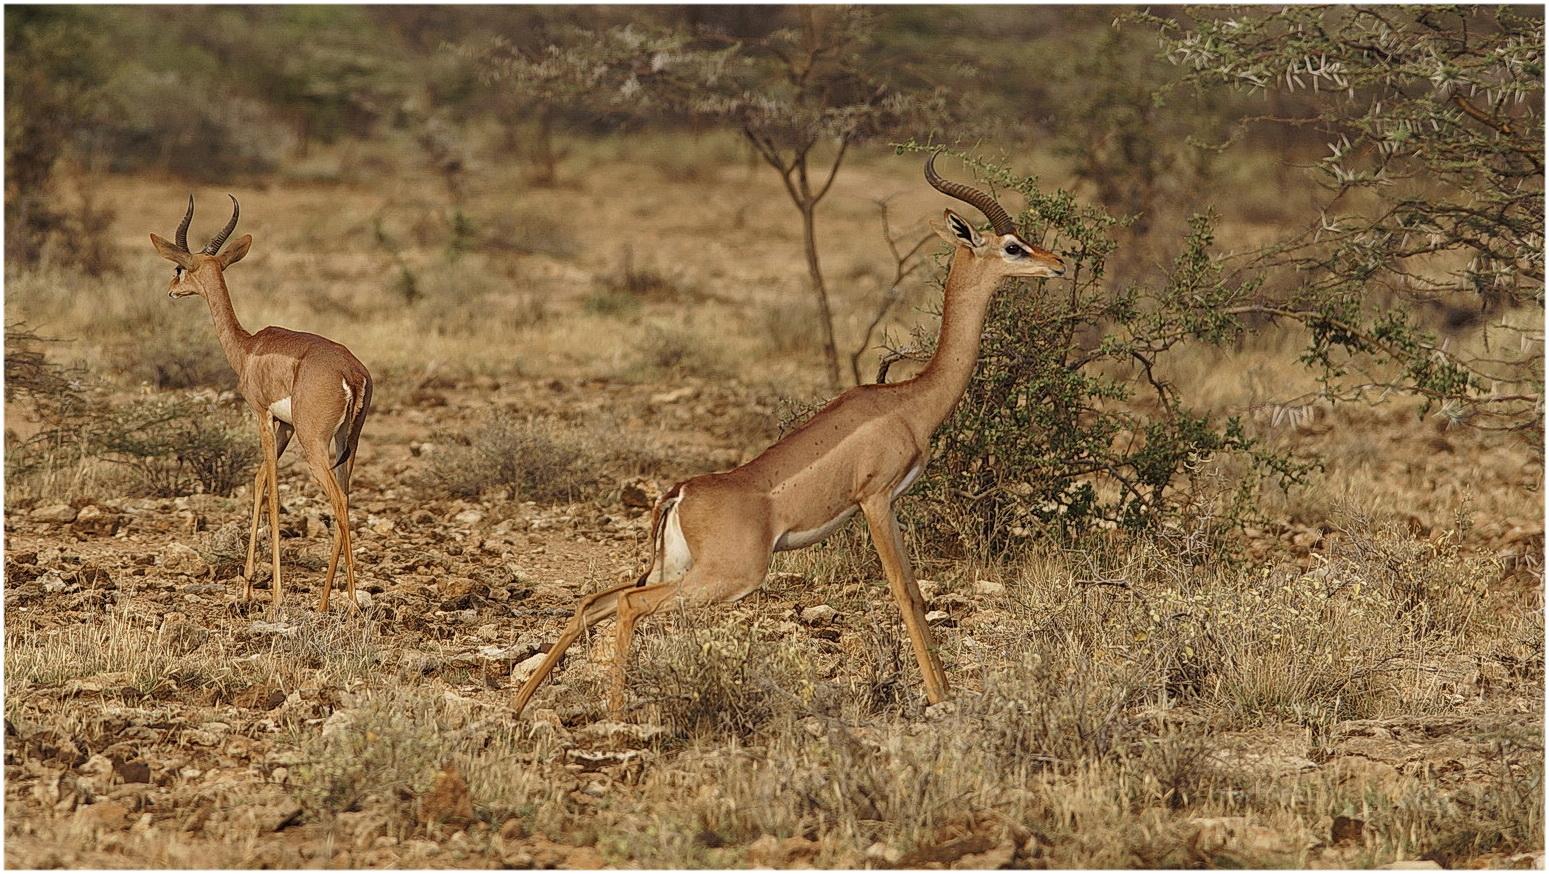 Giraffengazelle markiert das Territorium